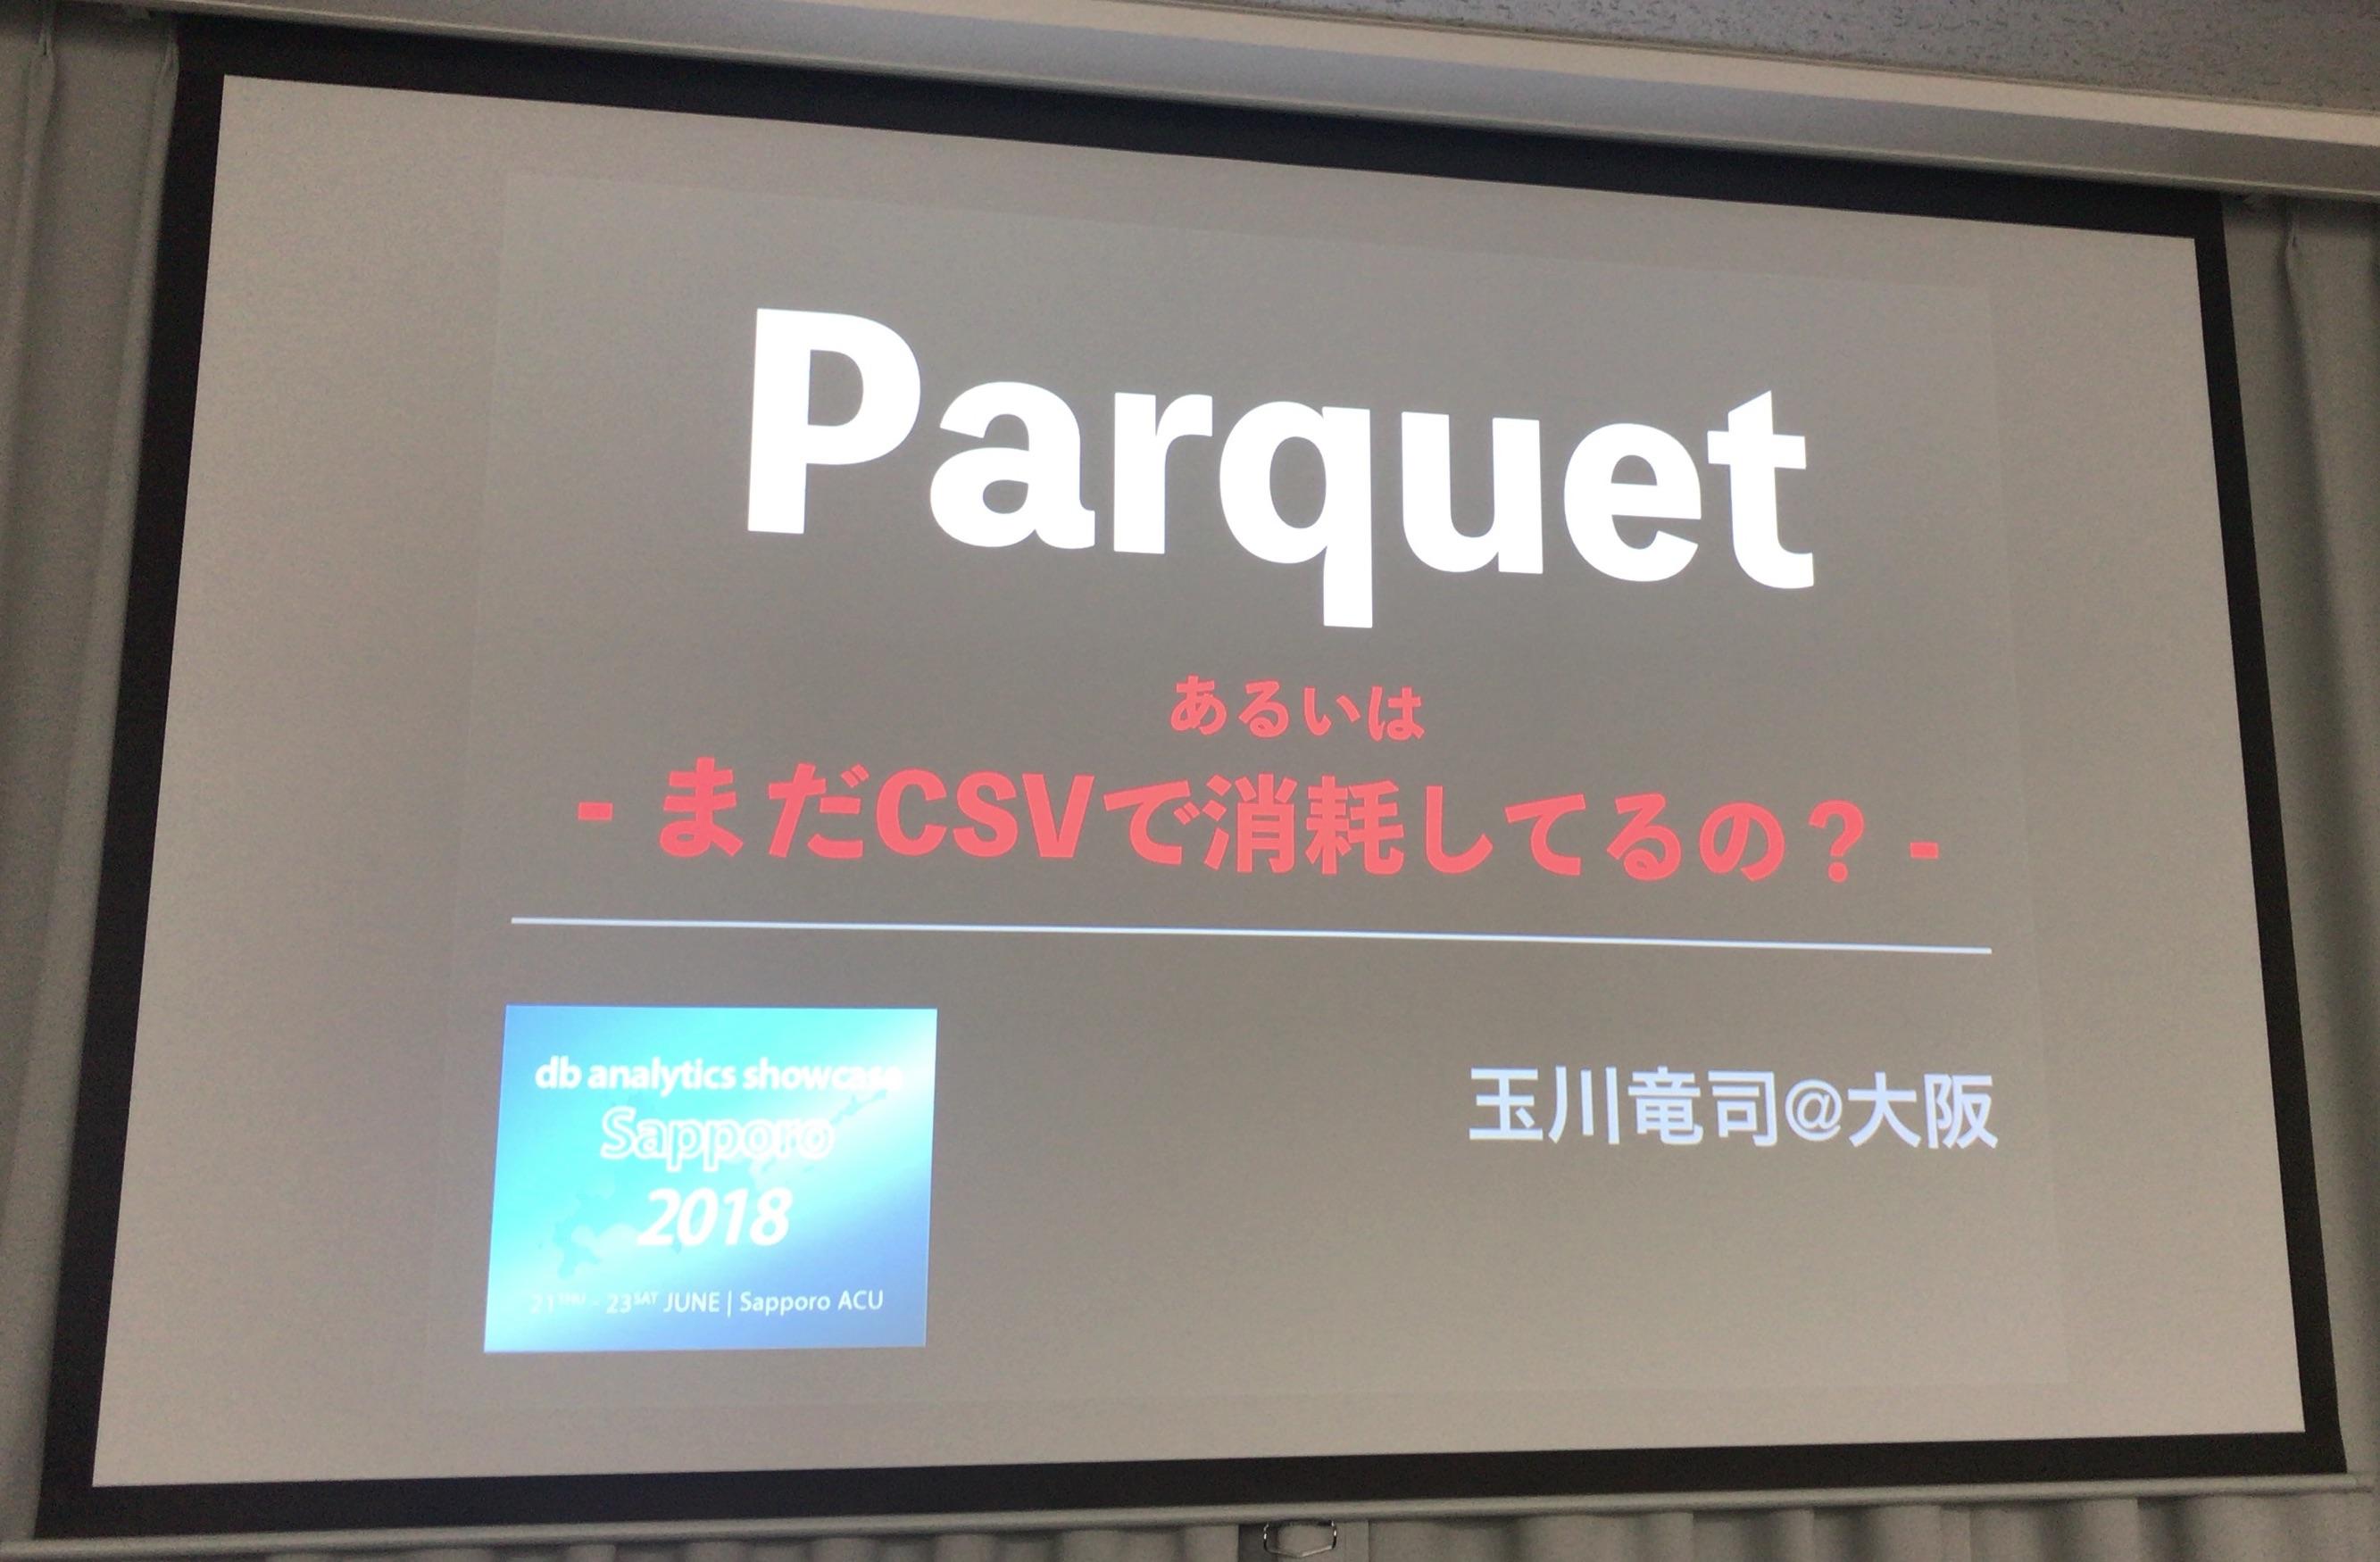 db analytics showcase Sapporo 2018」で玉川竜司さんのParquet